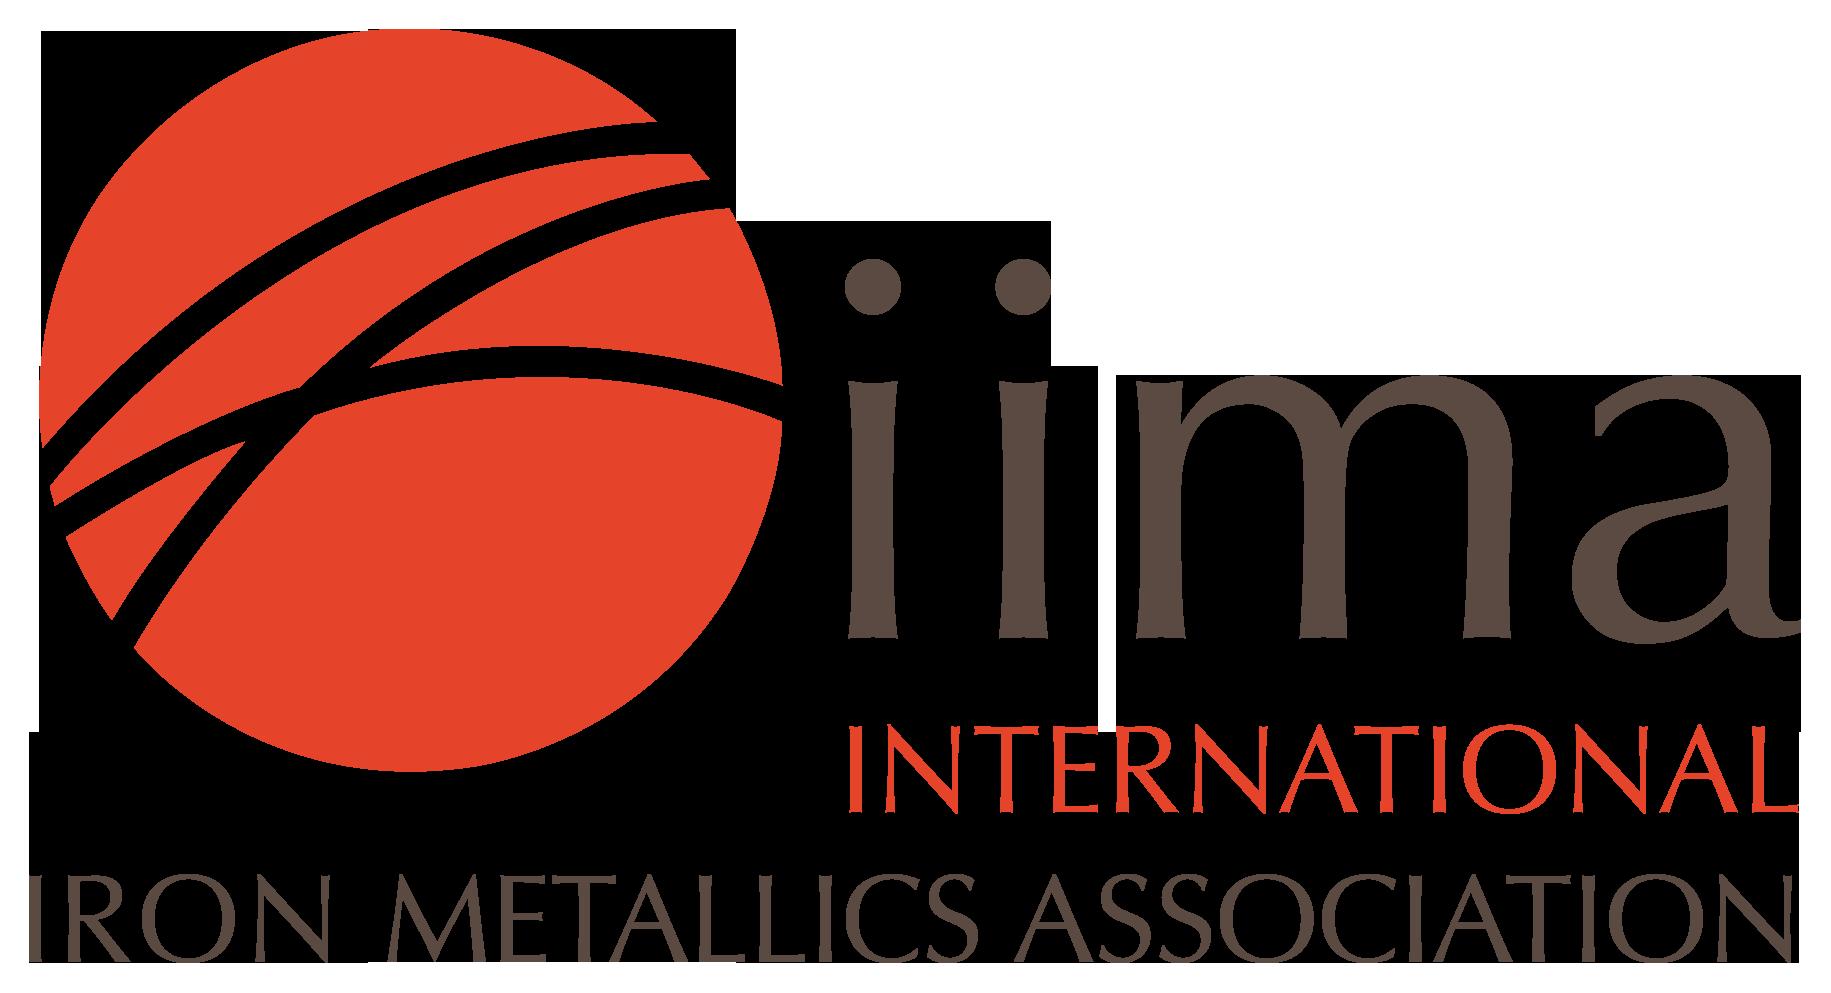 logo for International Iron Metallics Association